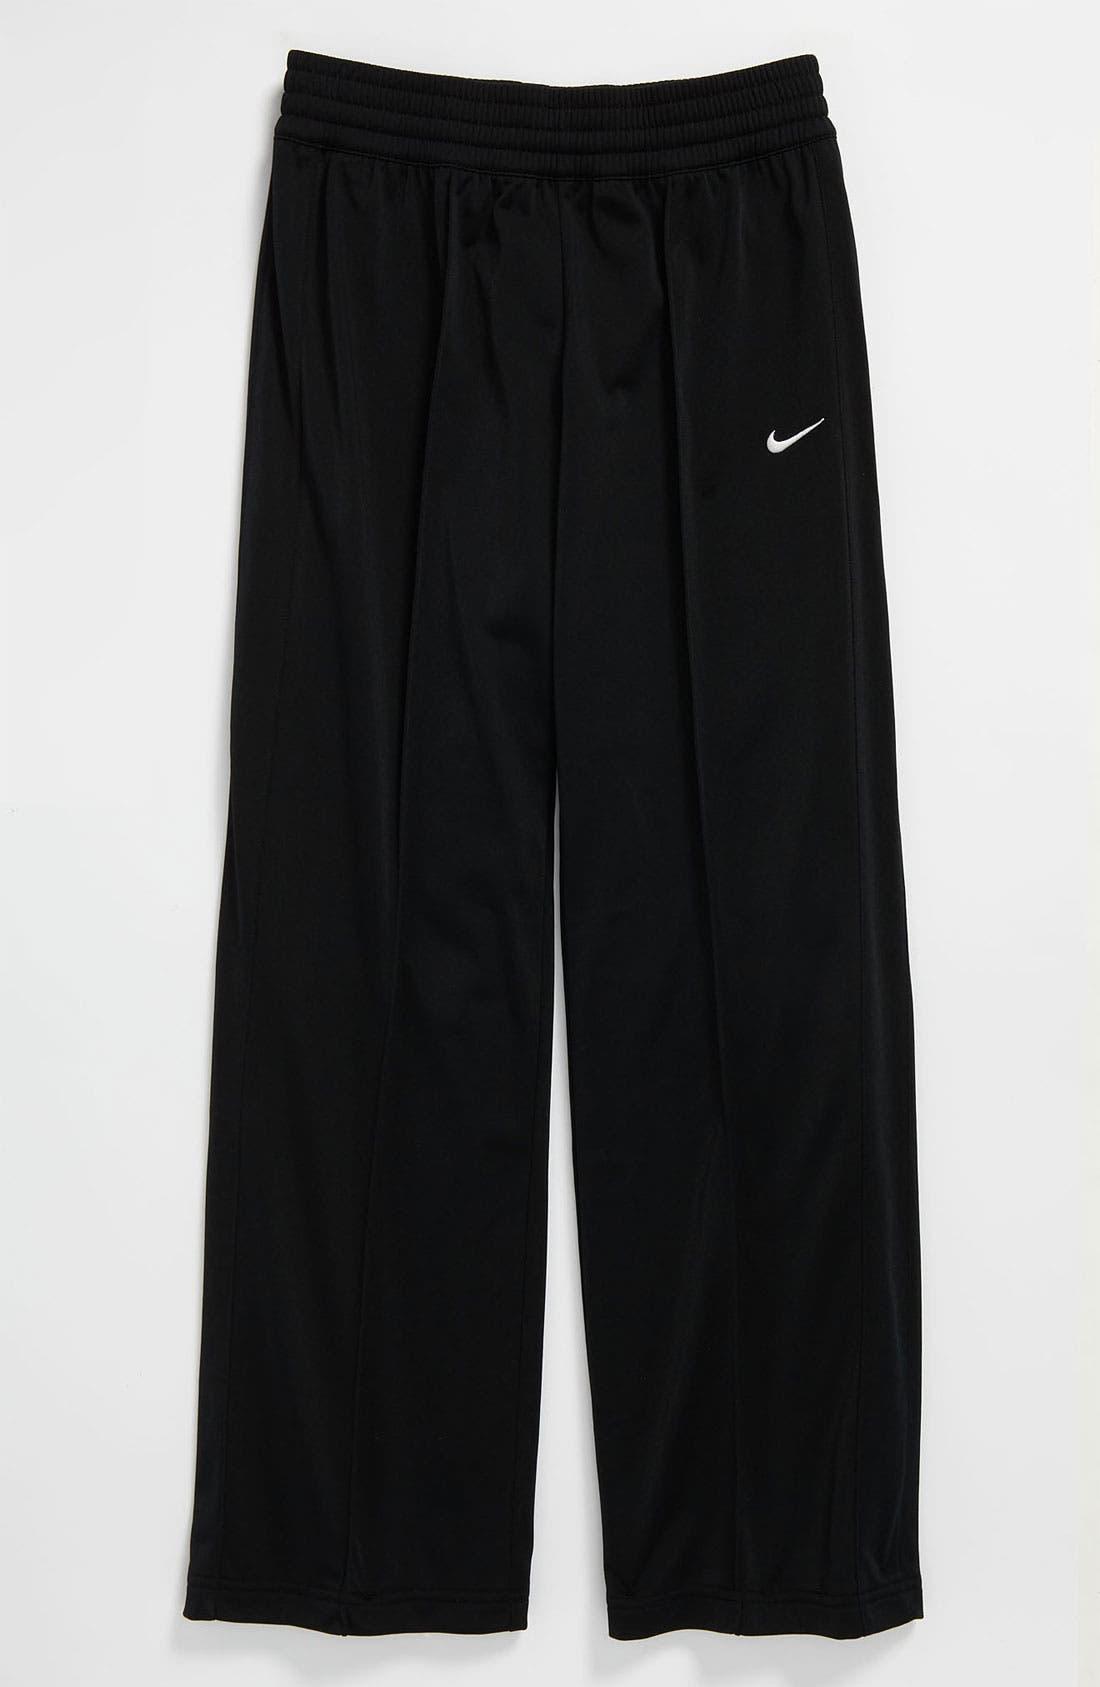 Alternate Image 1 Selected - Nike 'KO' Pants (Big Girls)